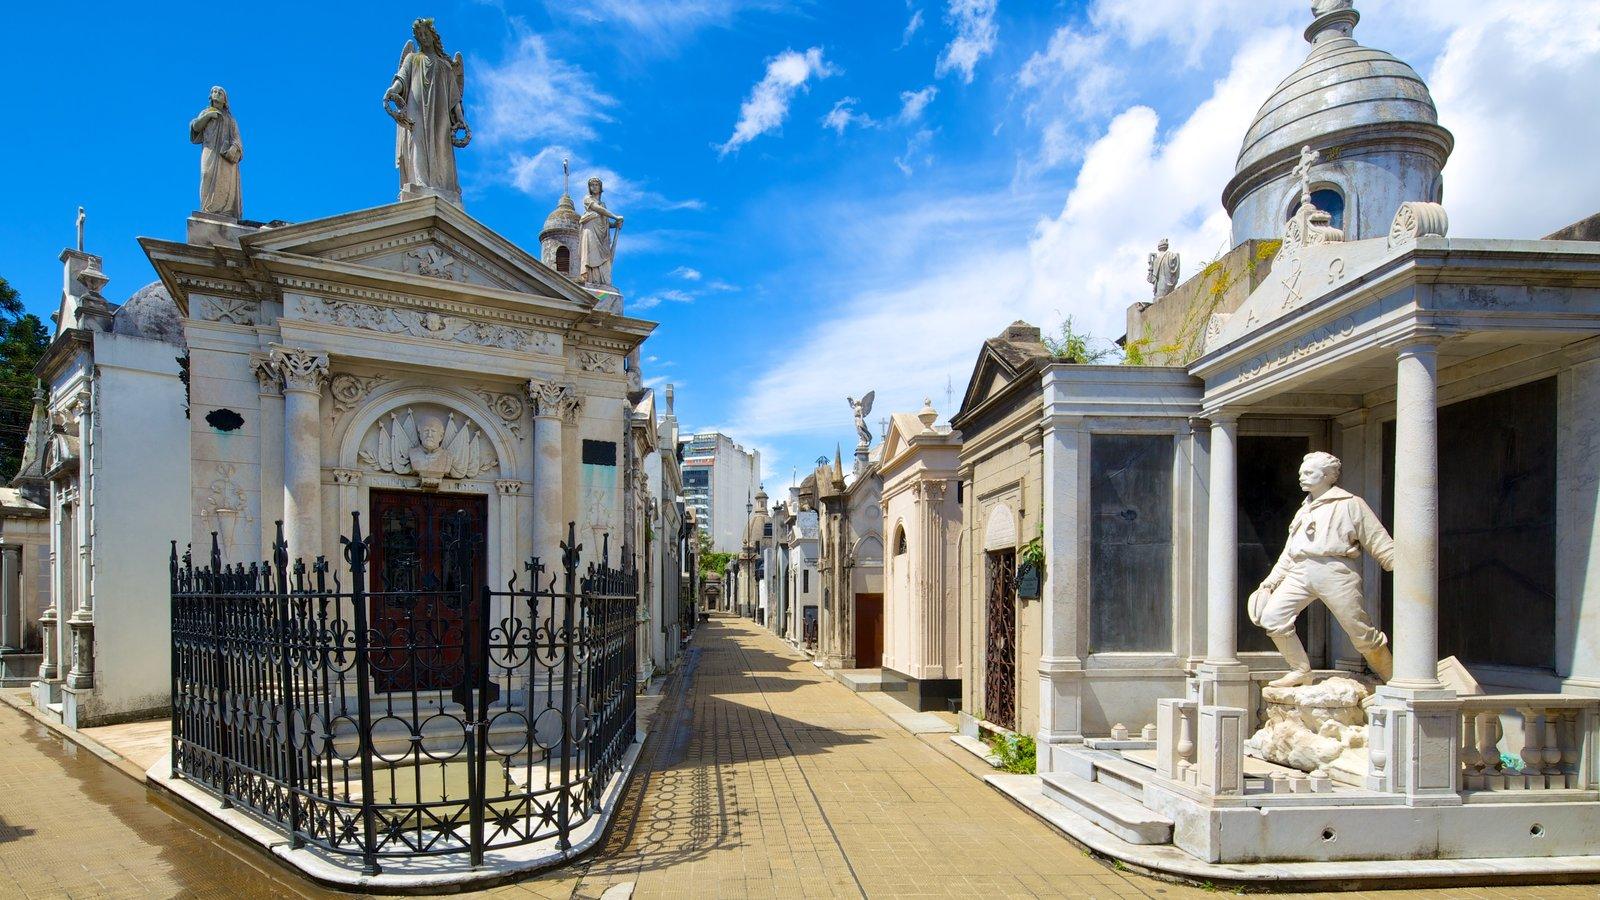 Cementerio de la Recoleta mostrando um cemitério